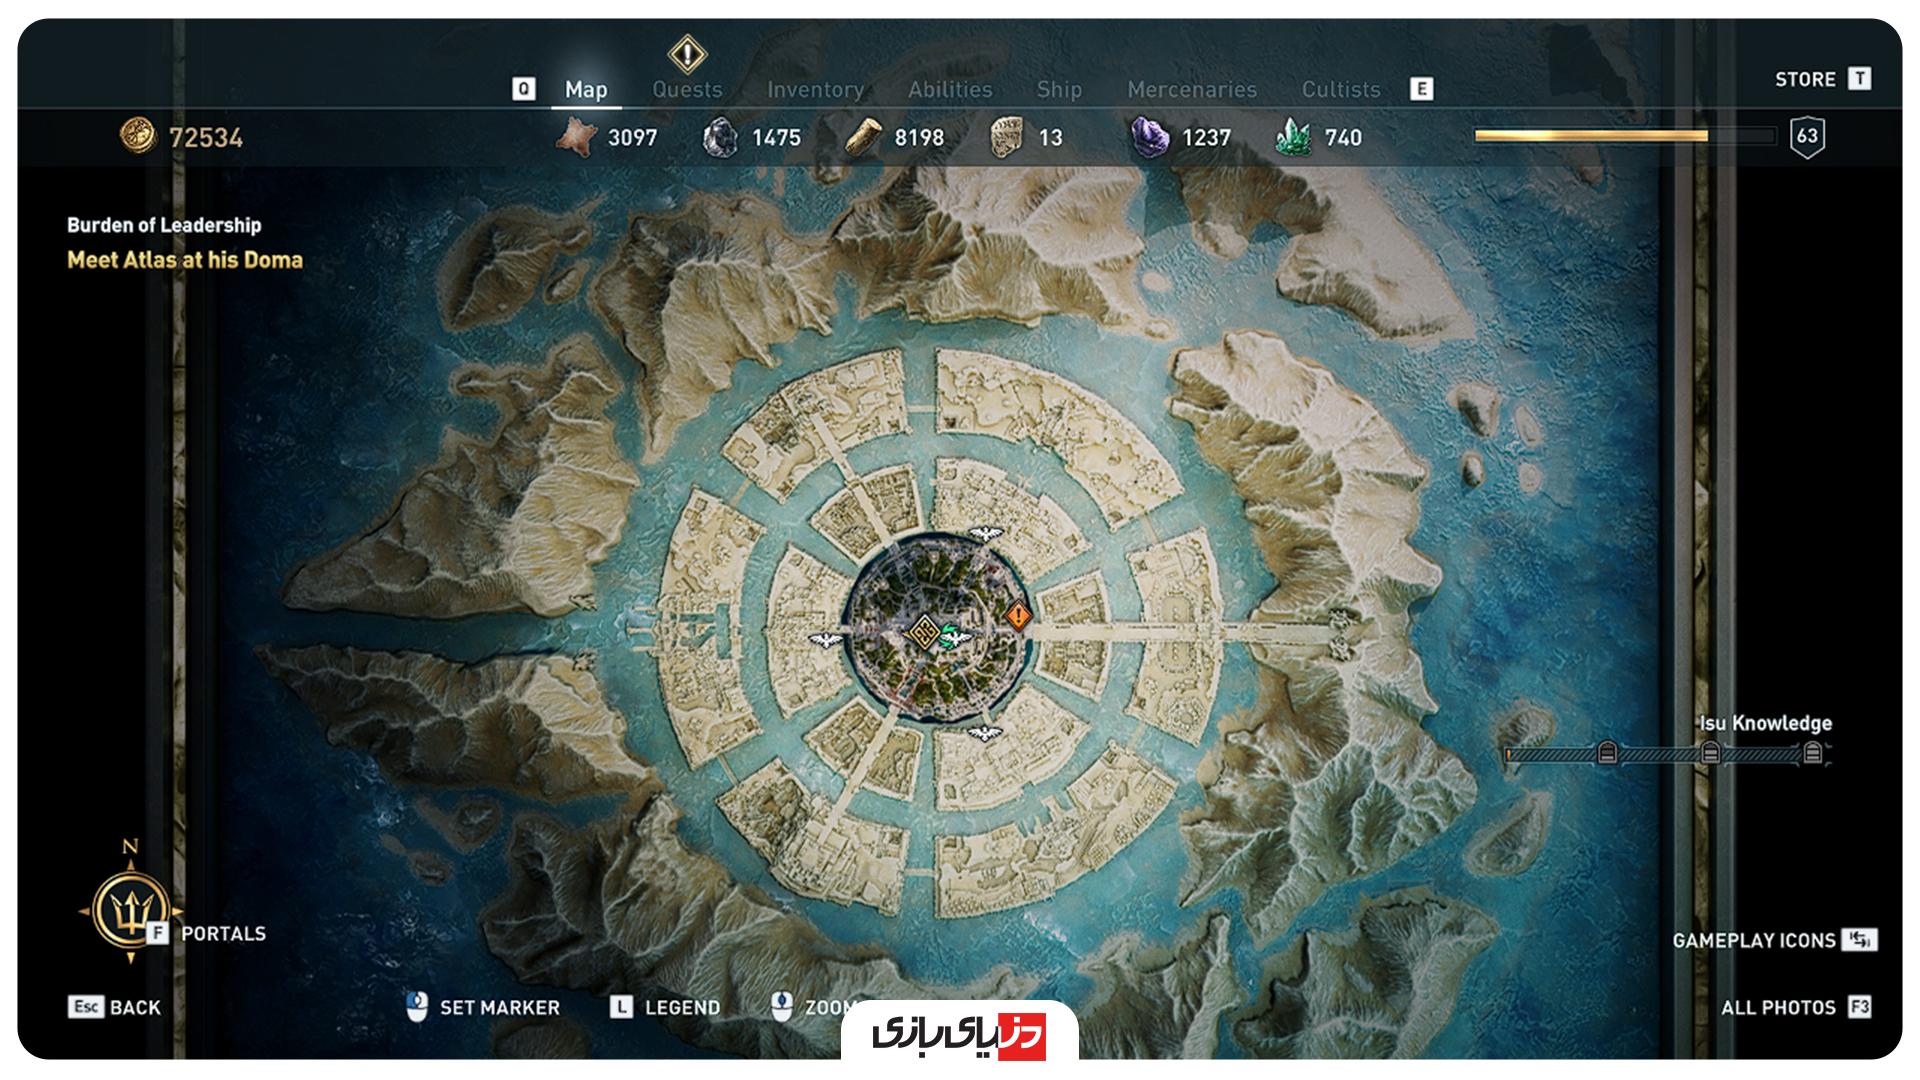 دیالسی the Fate of Atlantis